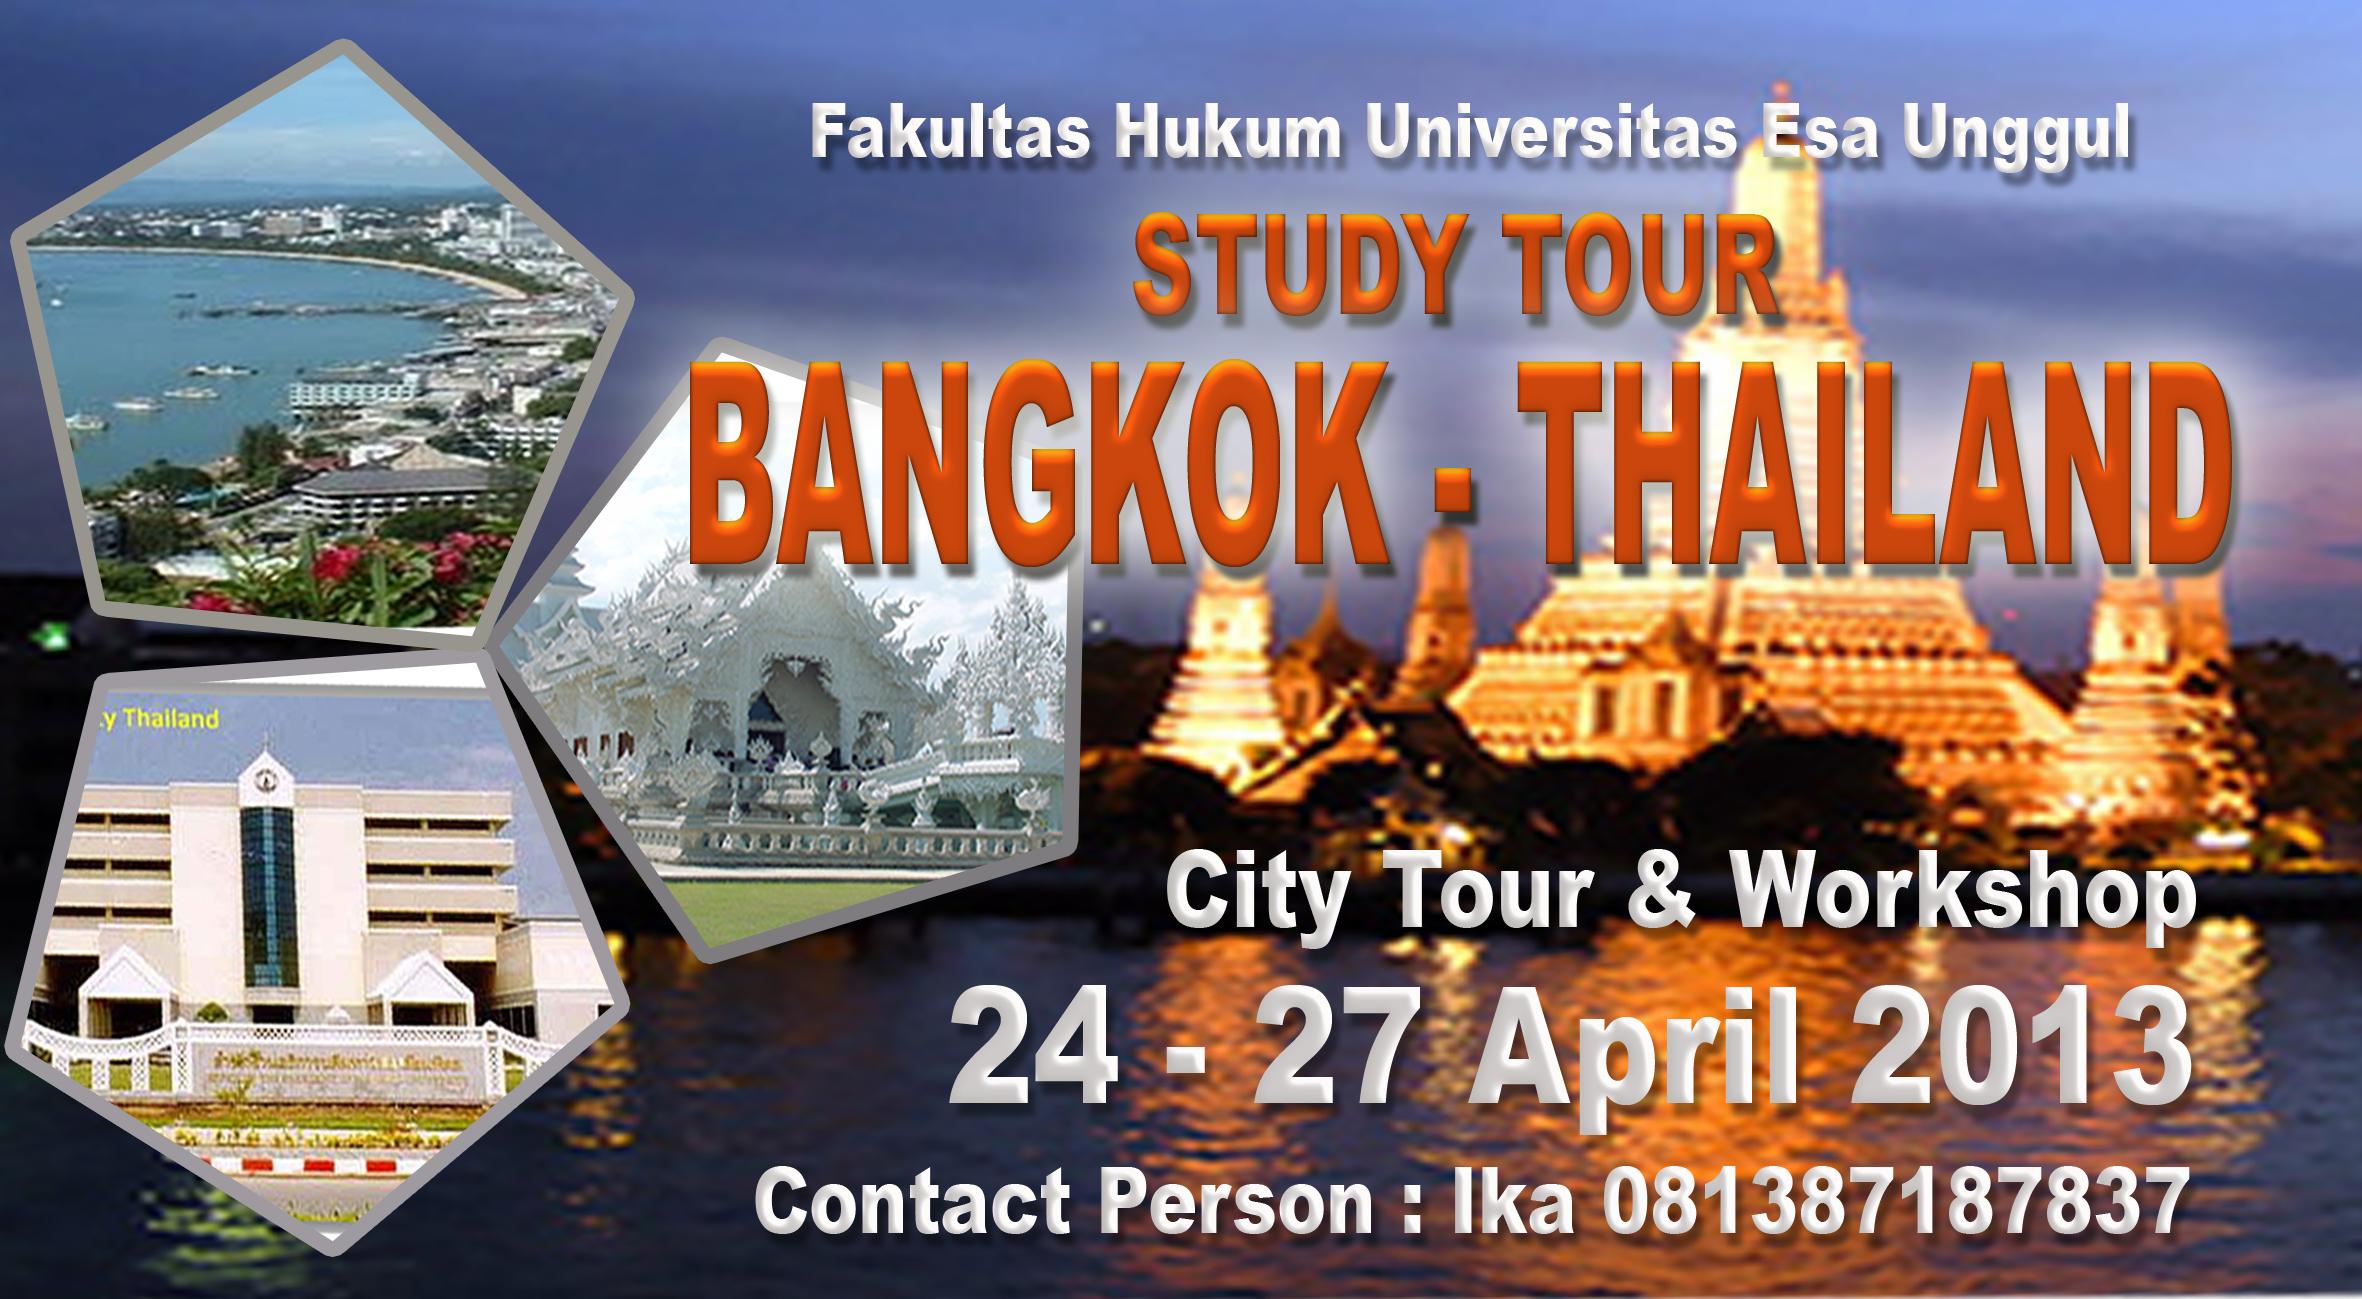 Fakultas Hukum menyelenggarakan Field Study to Bangkok, Thailand